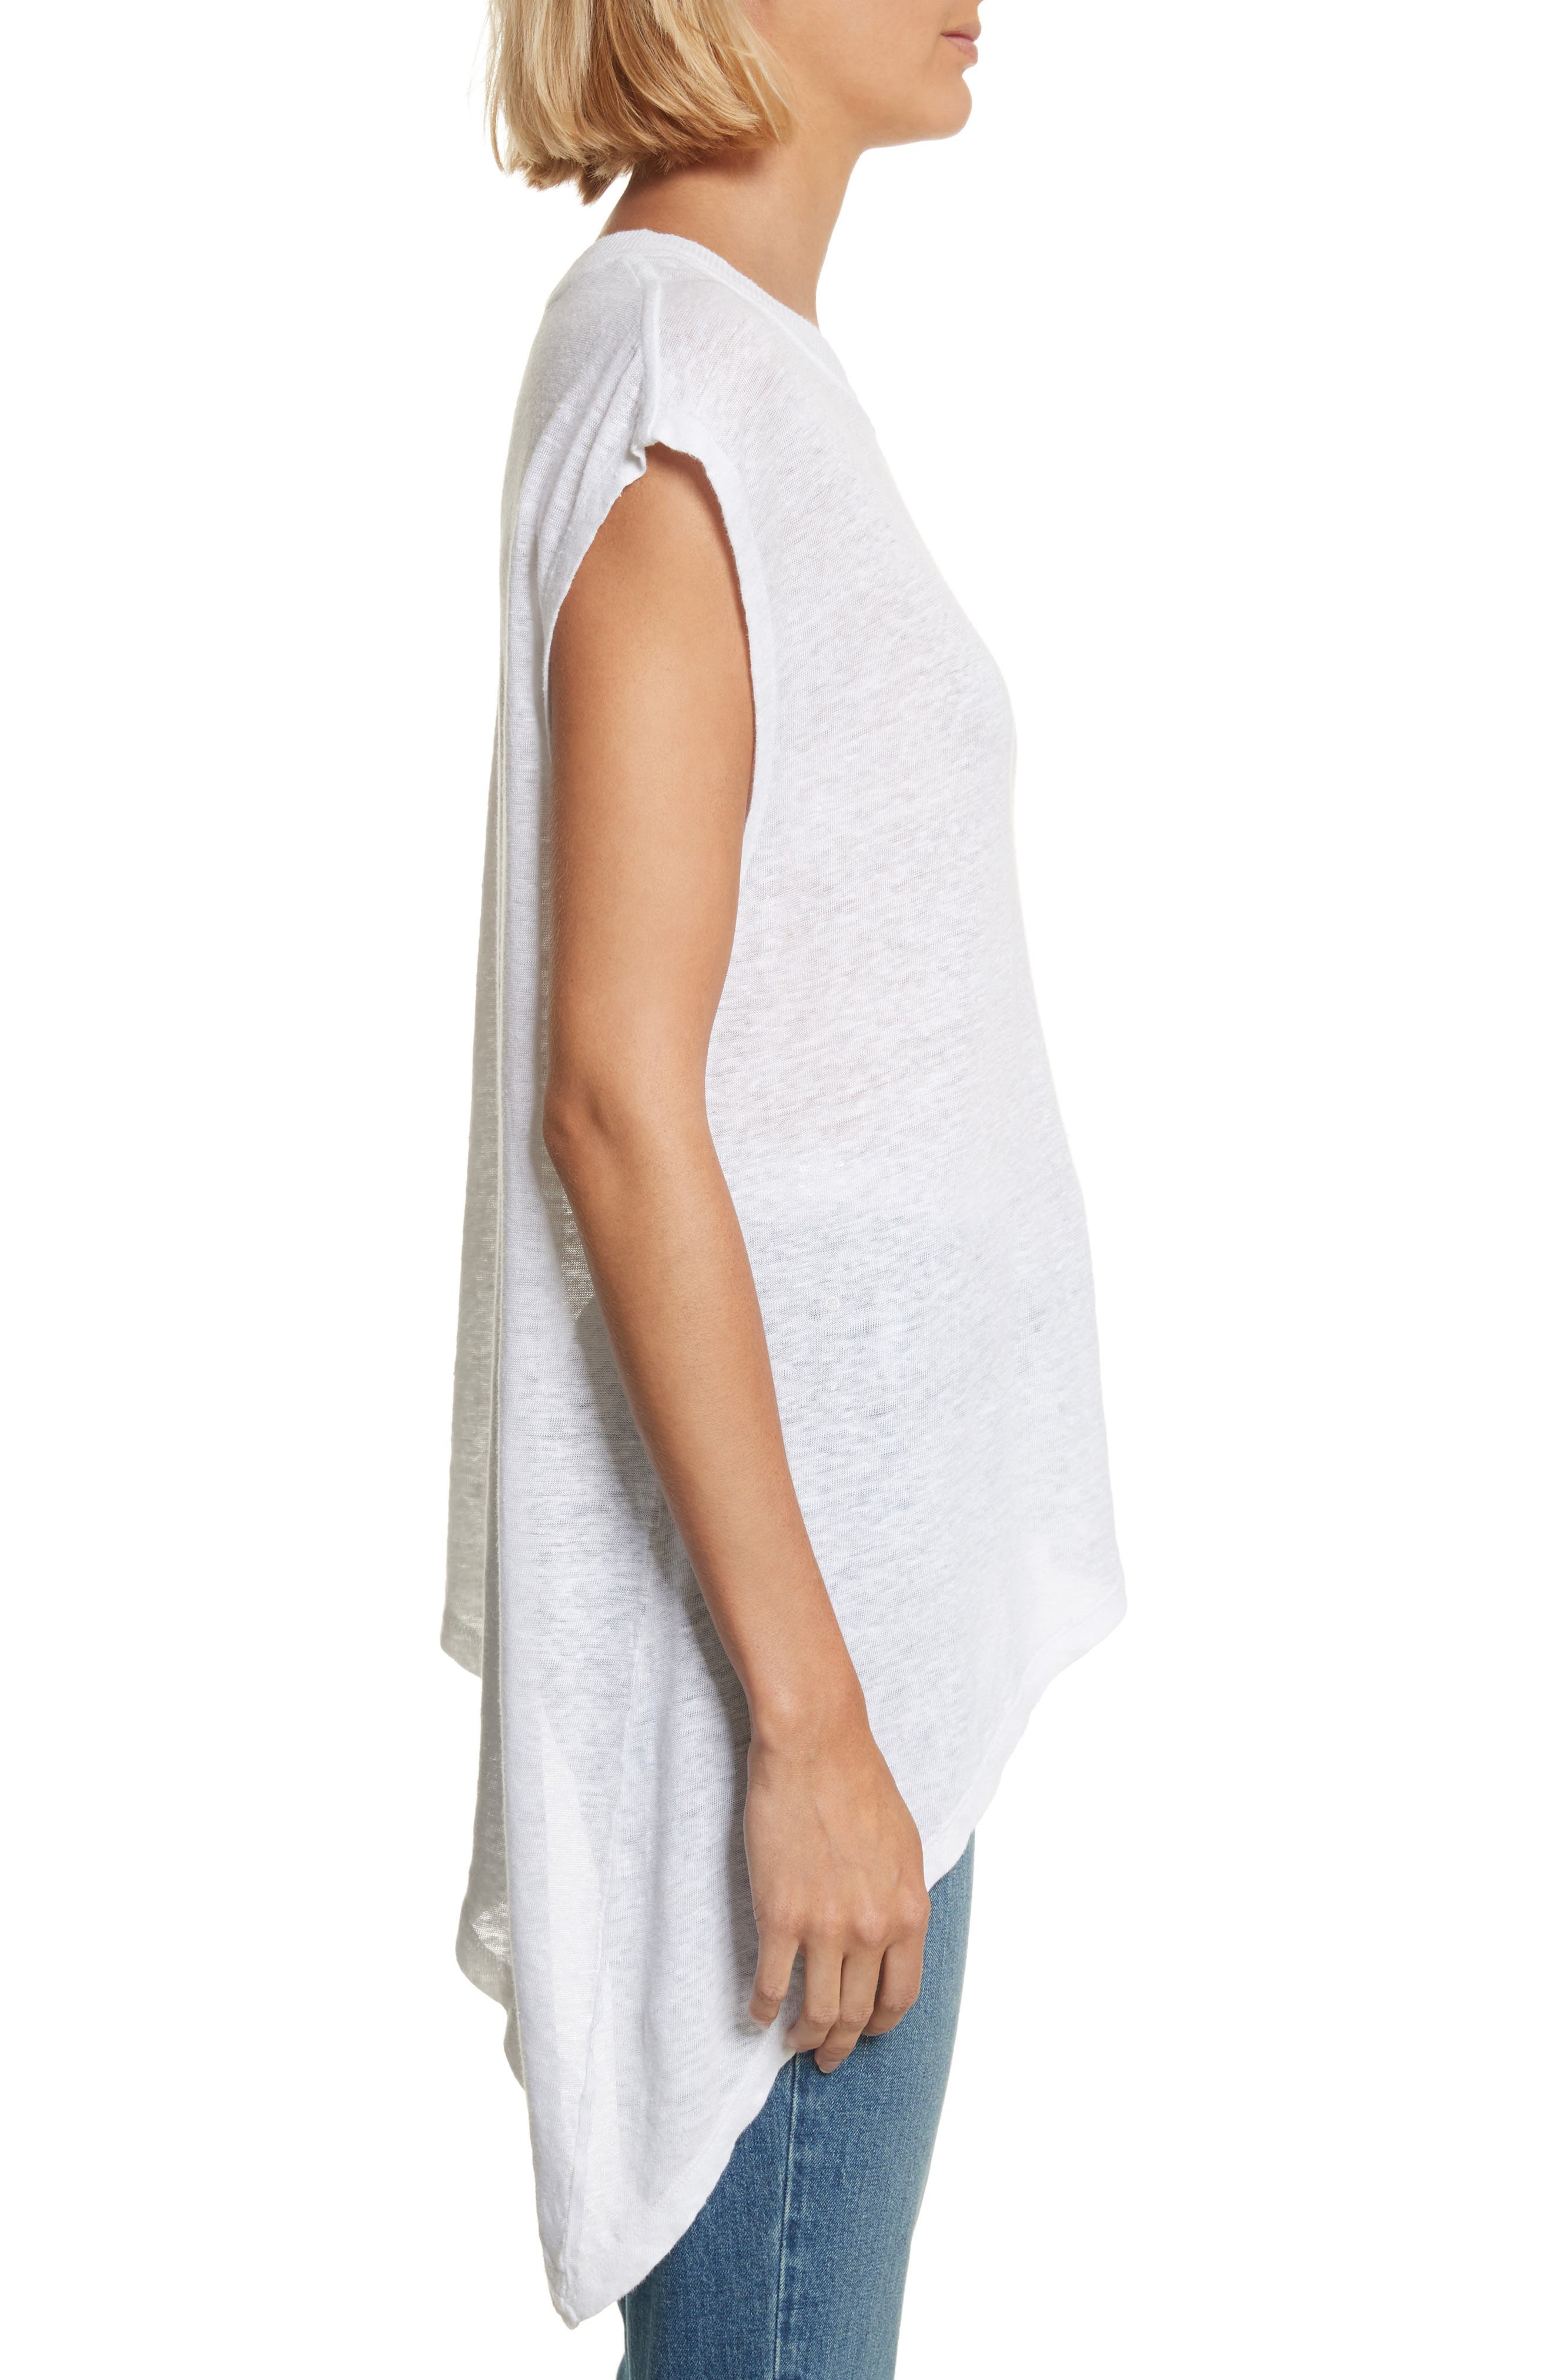 Karami Linen Asymmetrical Lace-Up Top,                             Alternate thumbnail 3, color,                             White